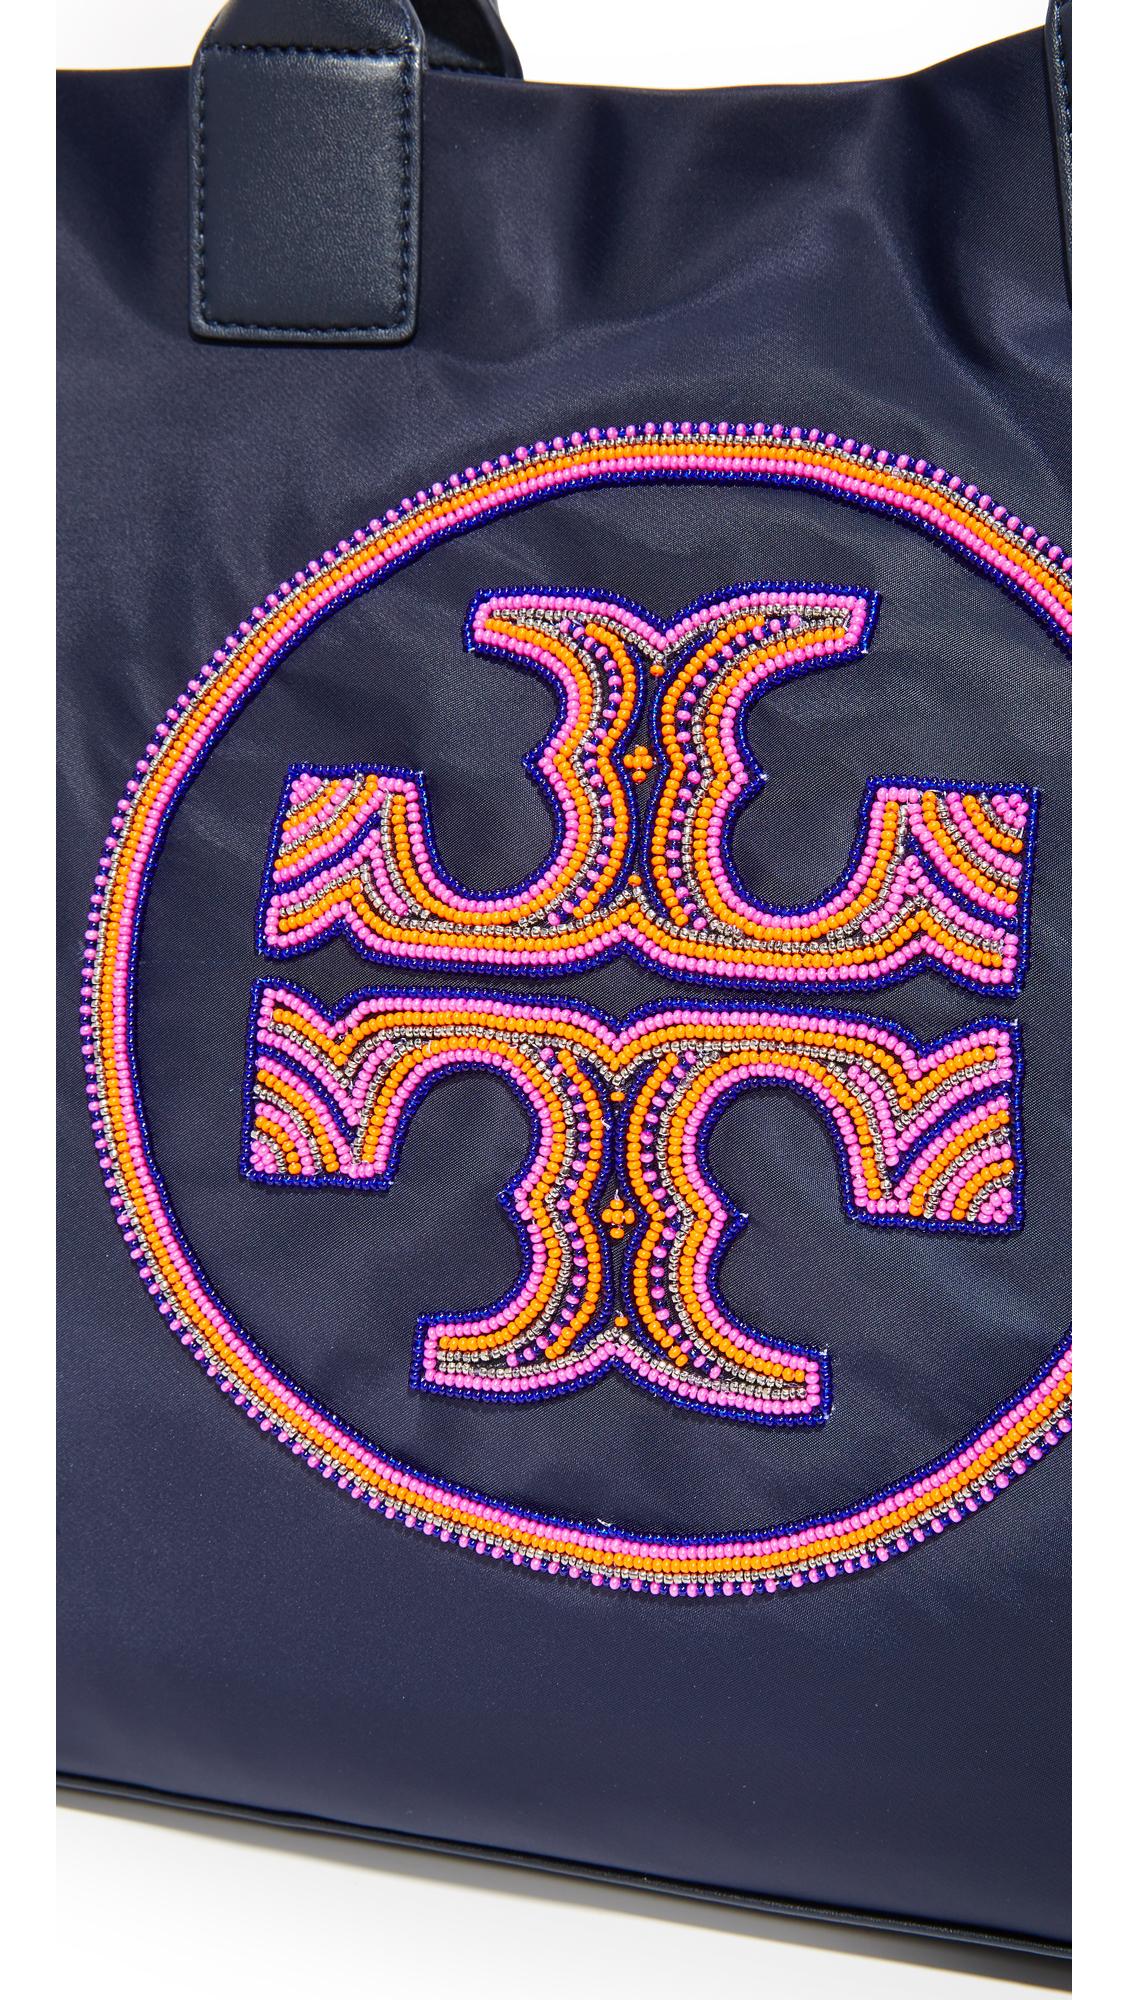 f139a0f10b16 Tory Burch Ella Beaded Logo Tote